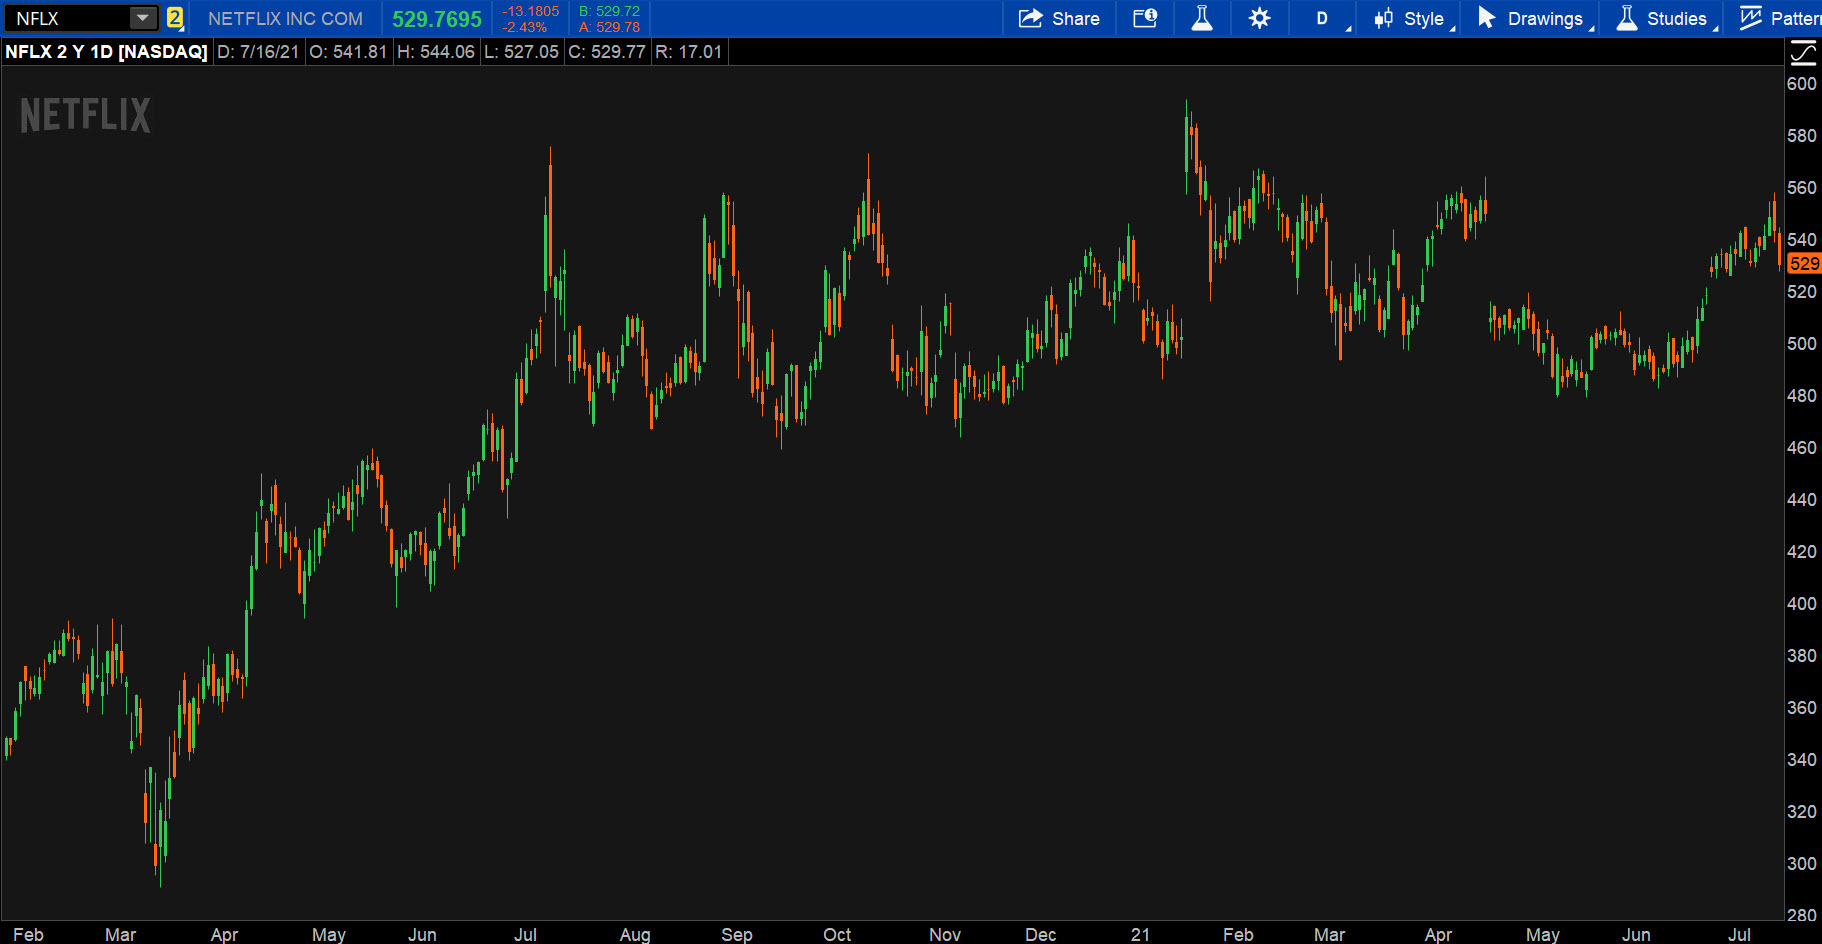 neflix stock price chart